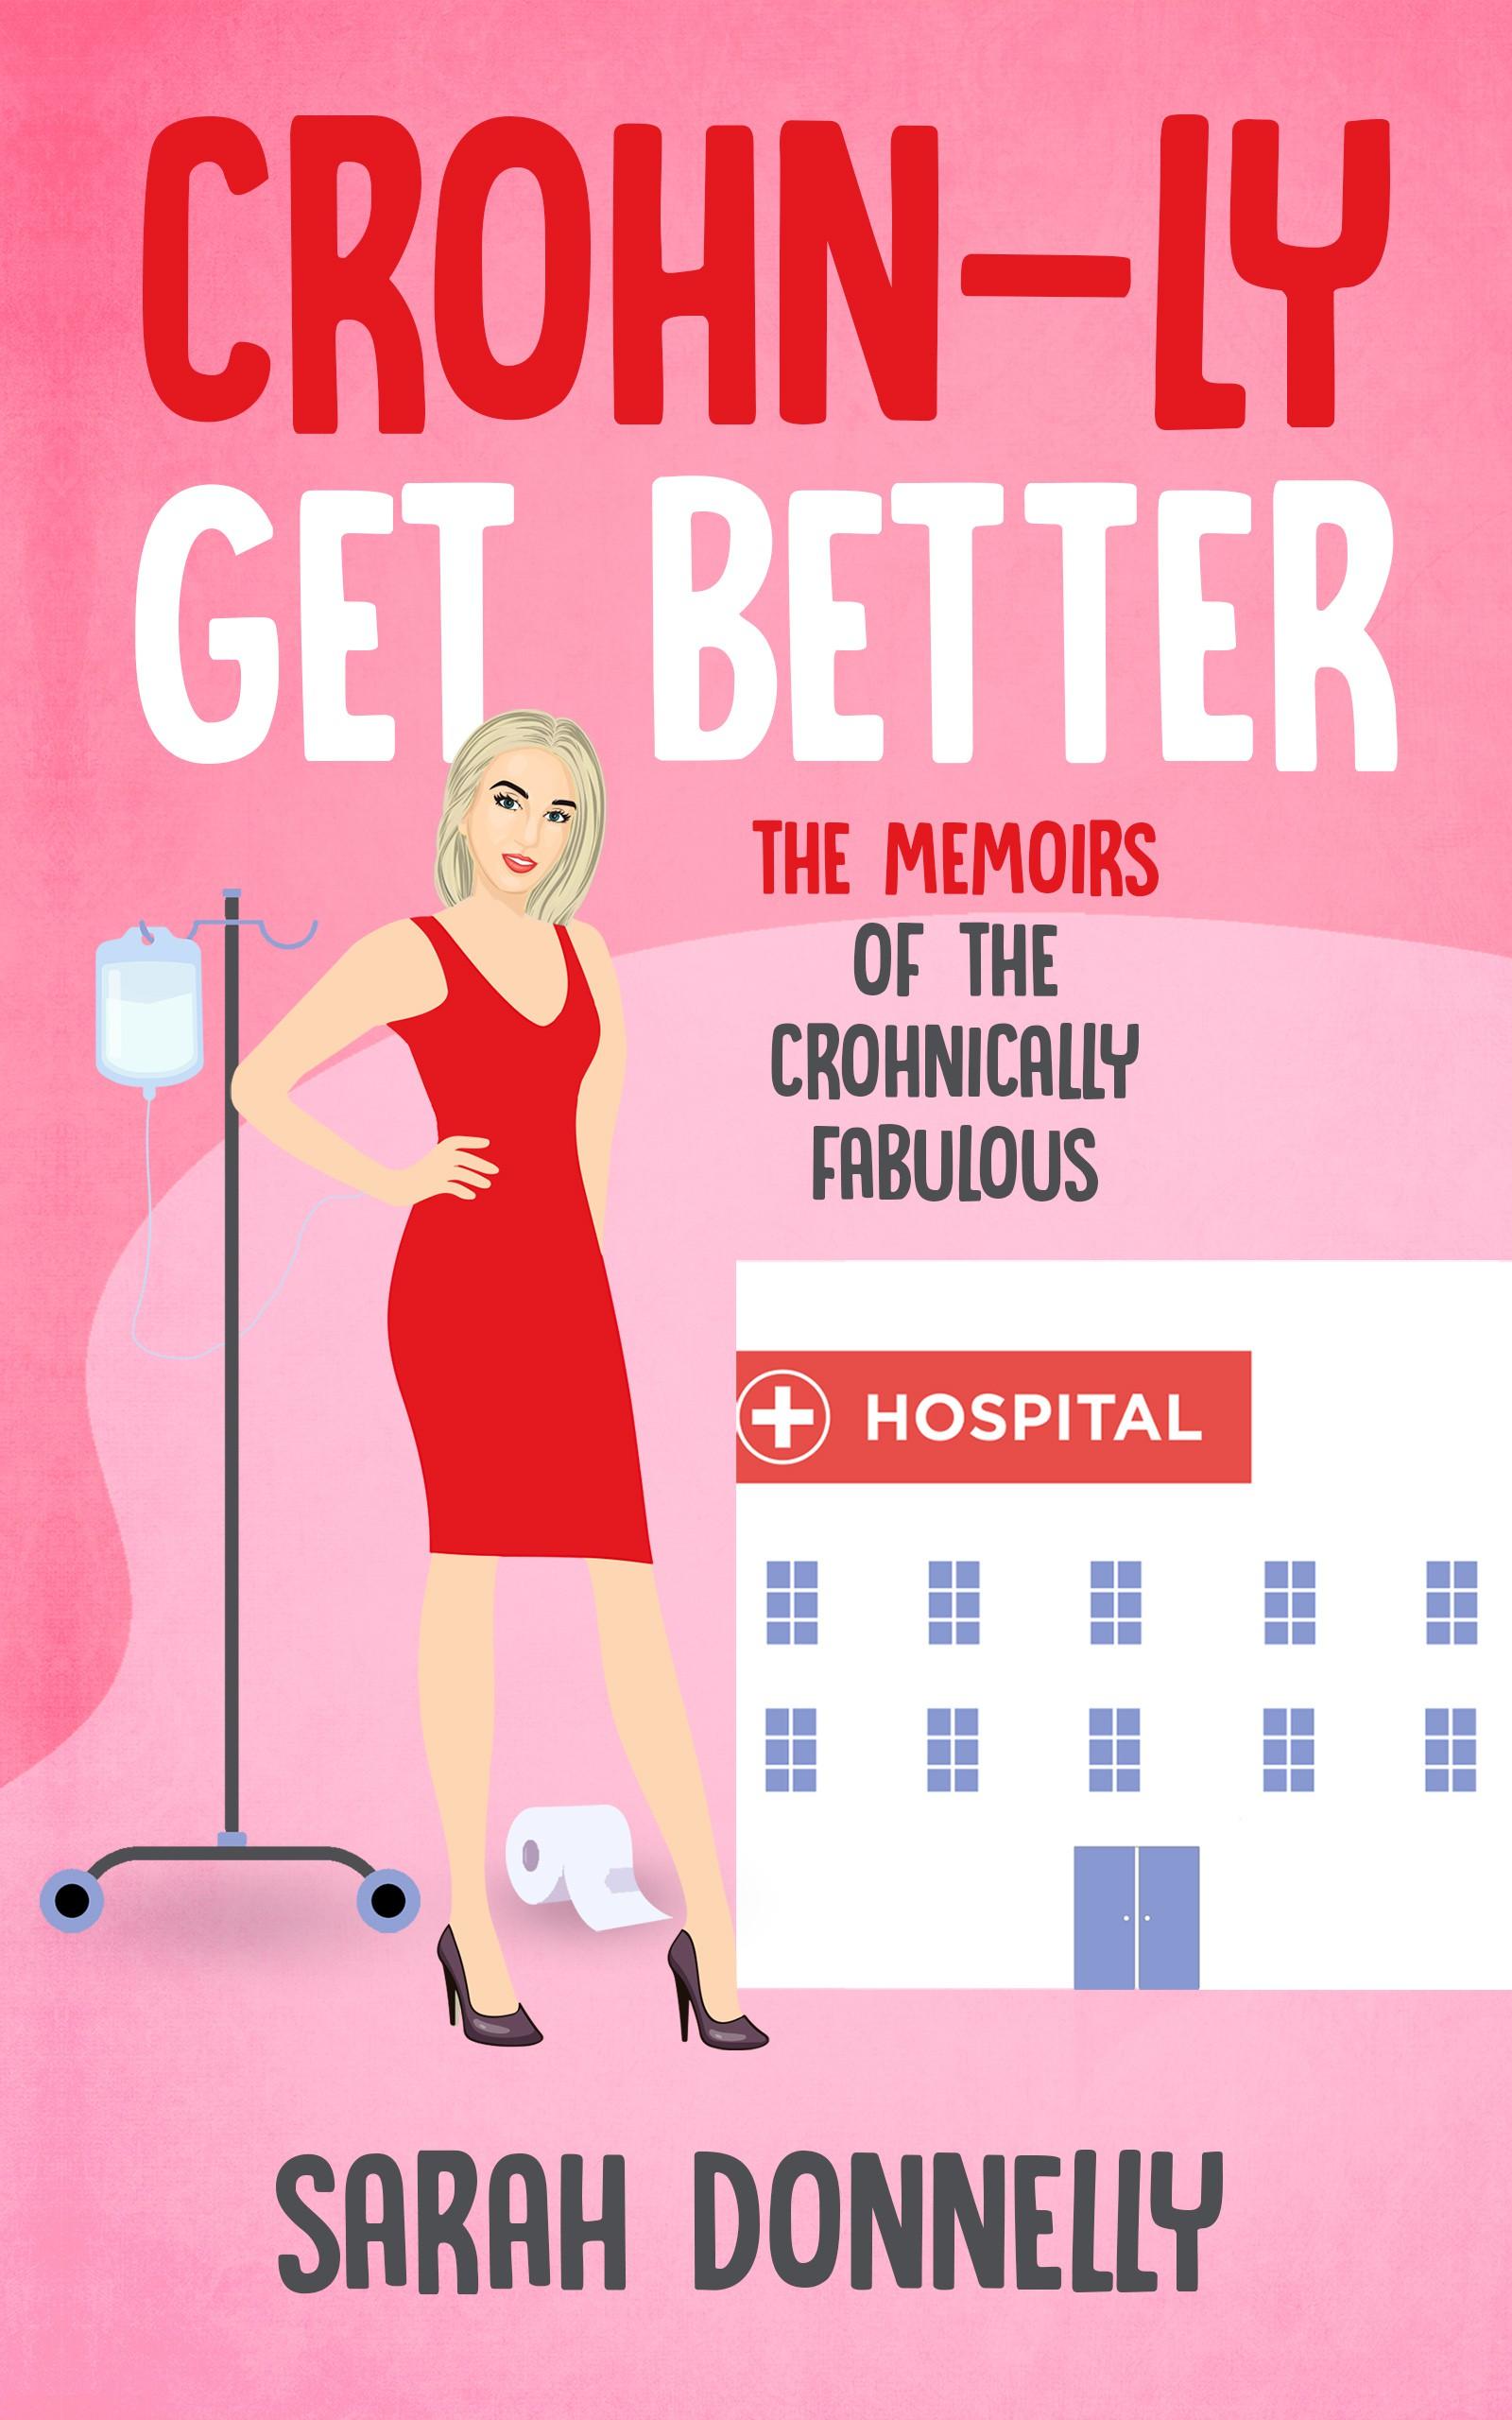 A memoir based off my experience with Crohn's disease